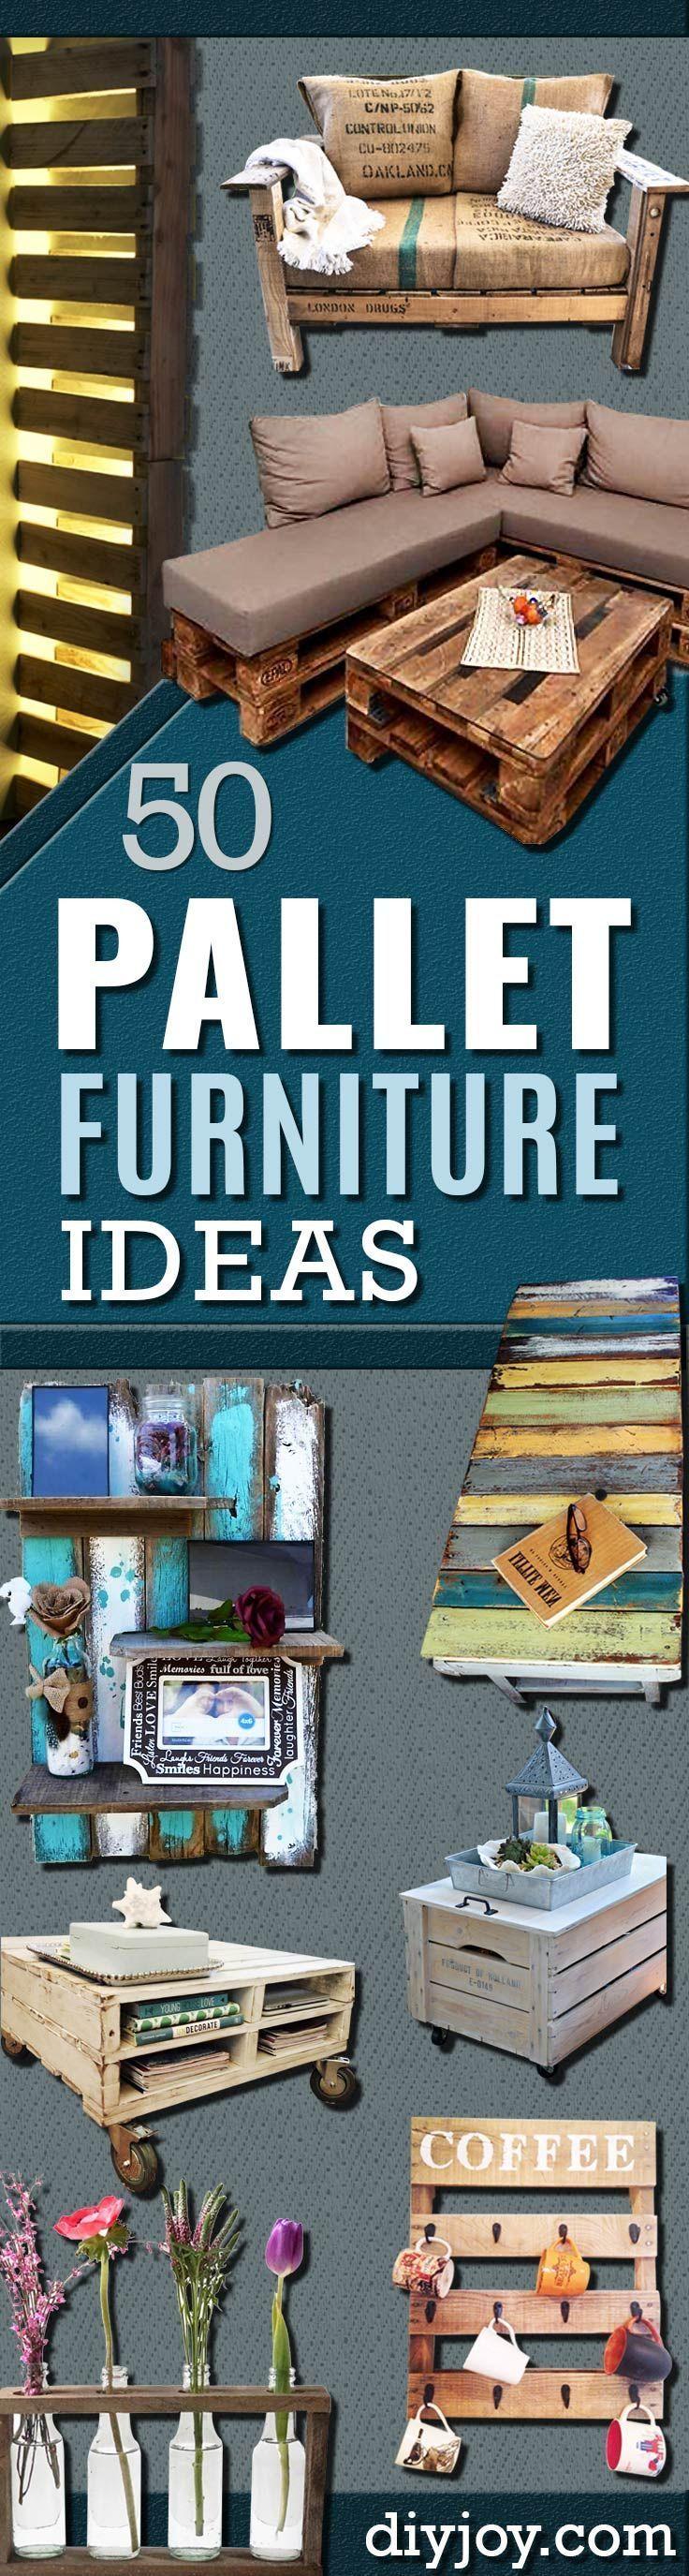 450 best DIY Furniture images on Pinterest | Bricolage, Furniture ...